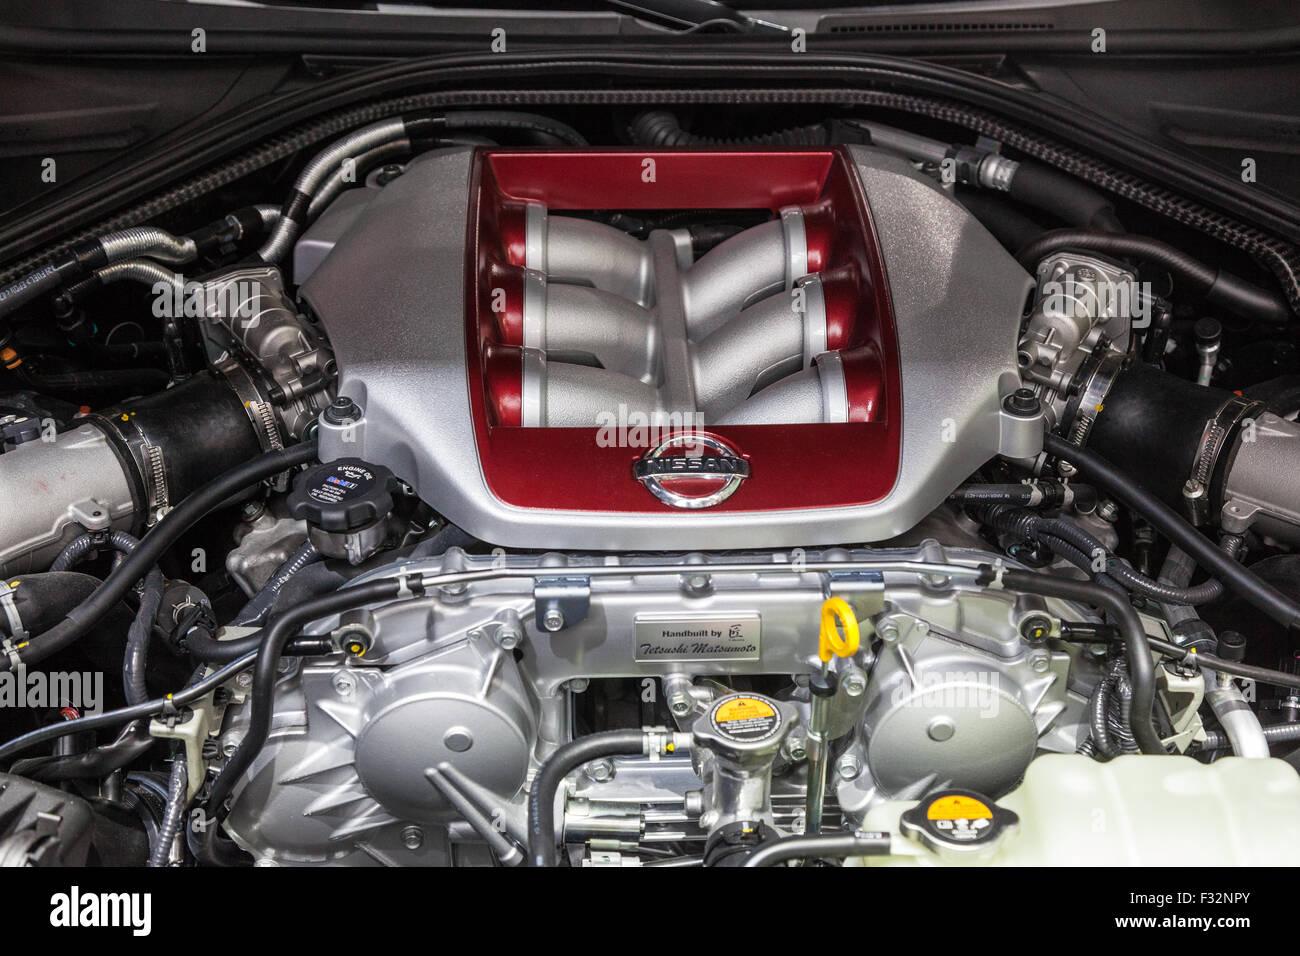 Nissan 370Z Nismo V6 Engine At The IAA International Motor Show 2015